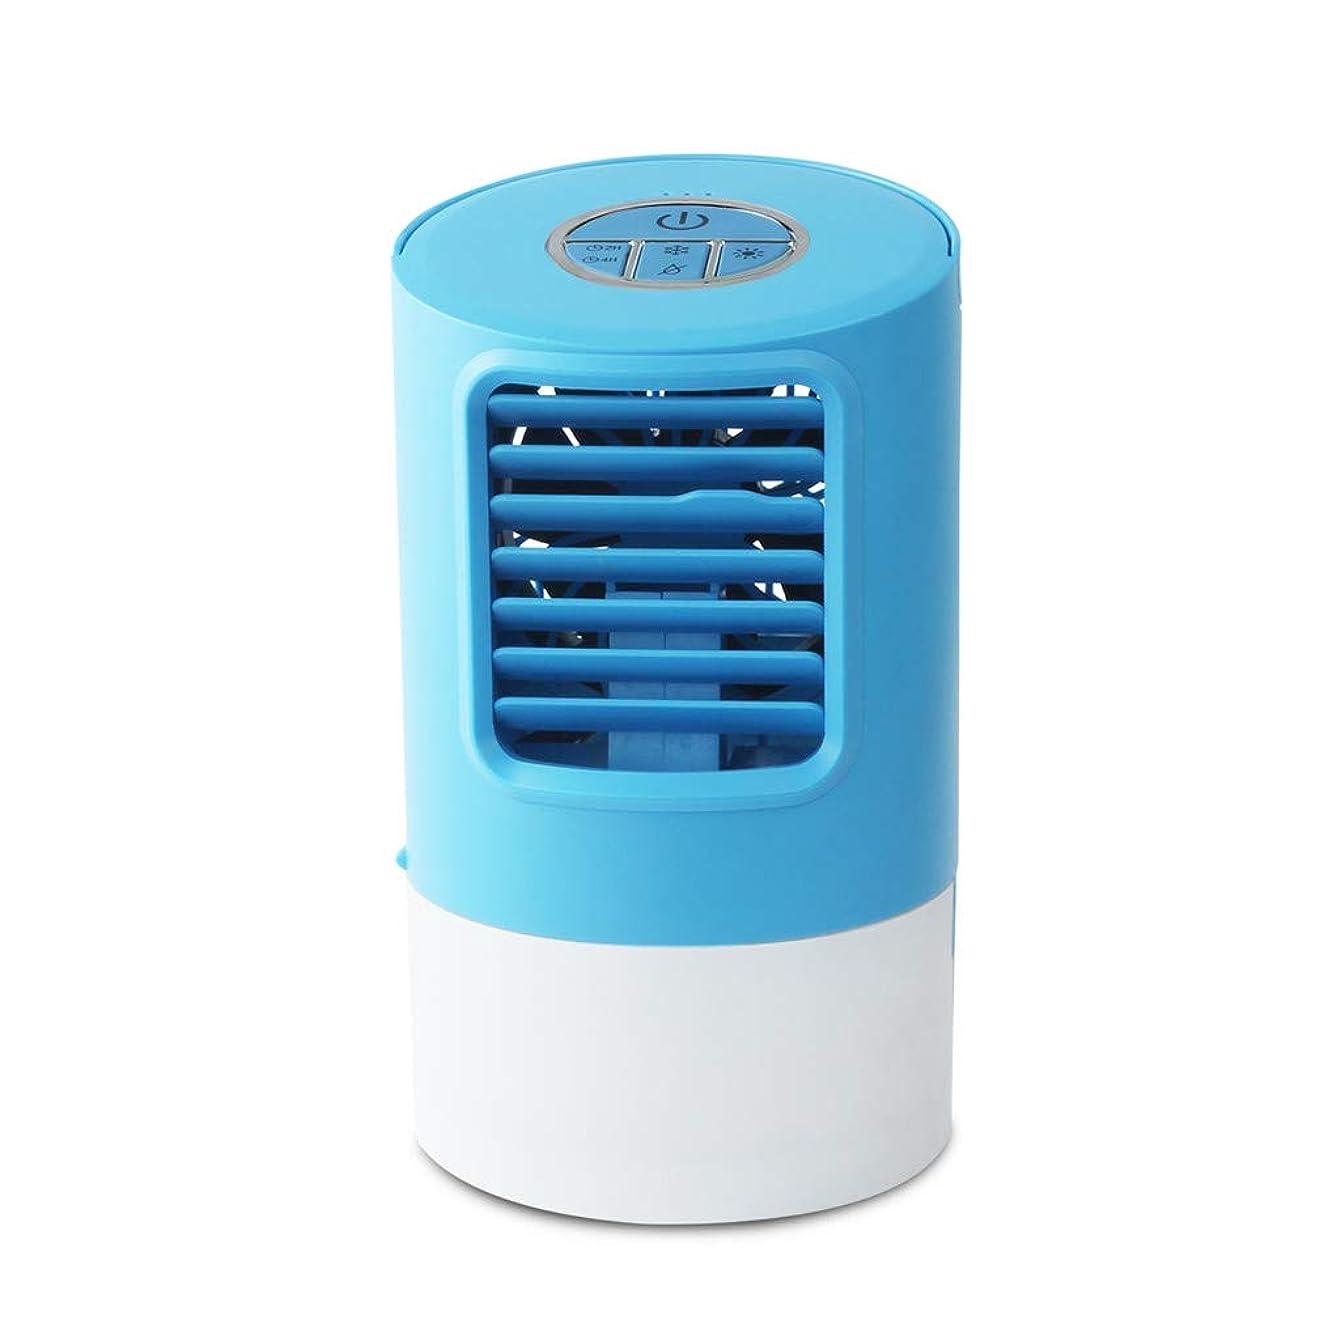 Hefu Air-Condition Fan,Portable Air Conditioner Fan Mini Evaporative Air Circulator Cooler Humidifier